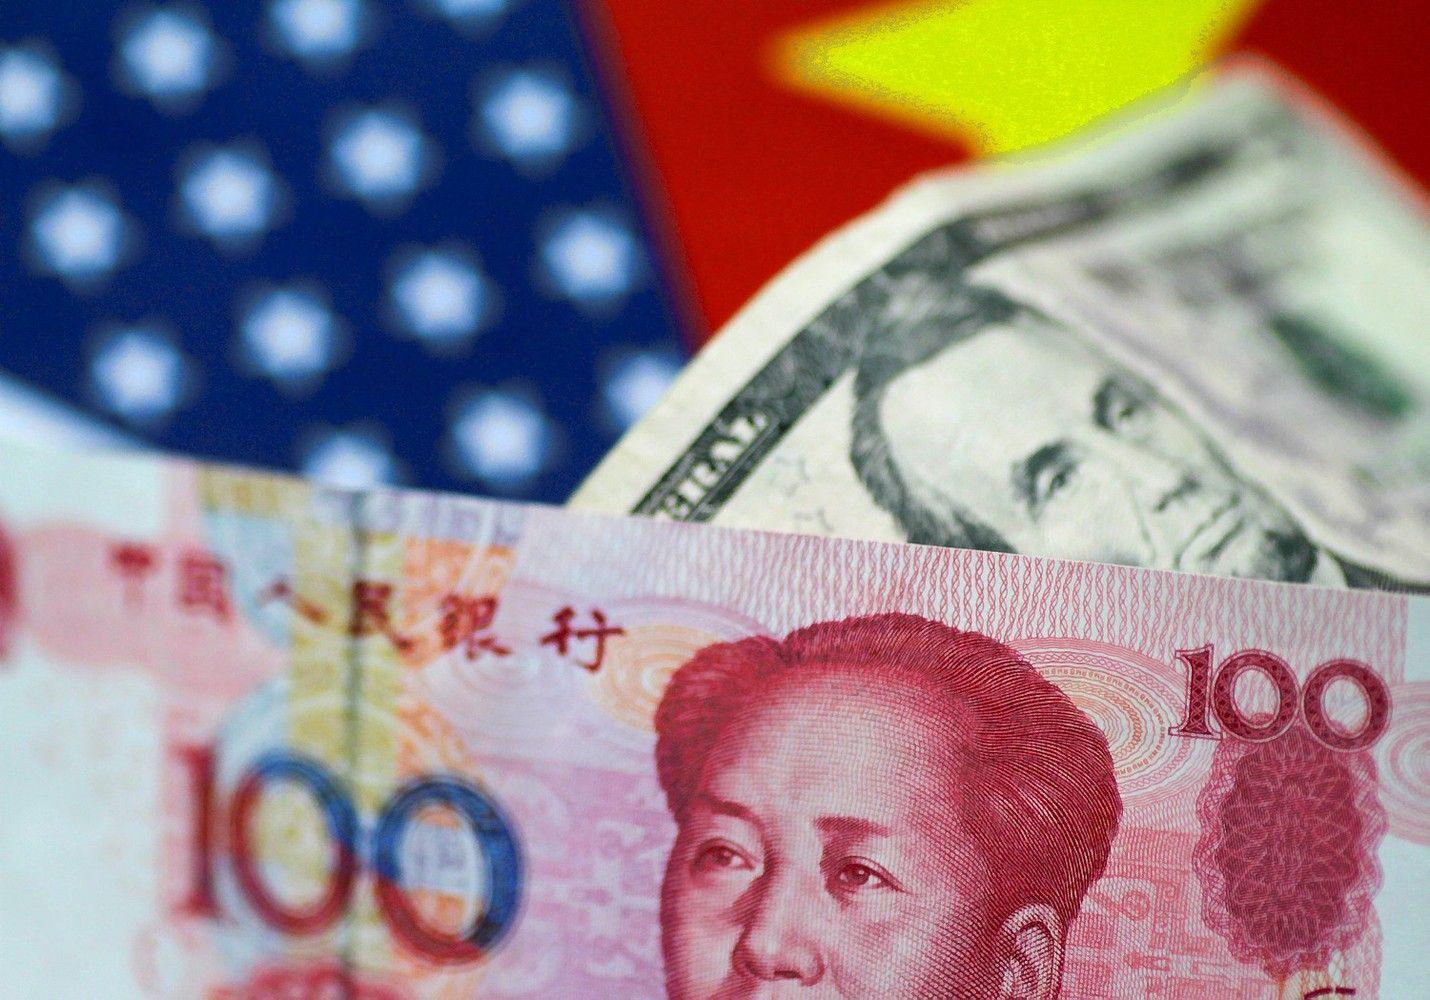 Stocks in Asia Mixed Ahead of Fed as Yuan Retreats: Markets Wrap